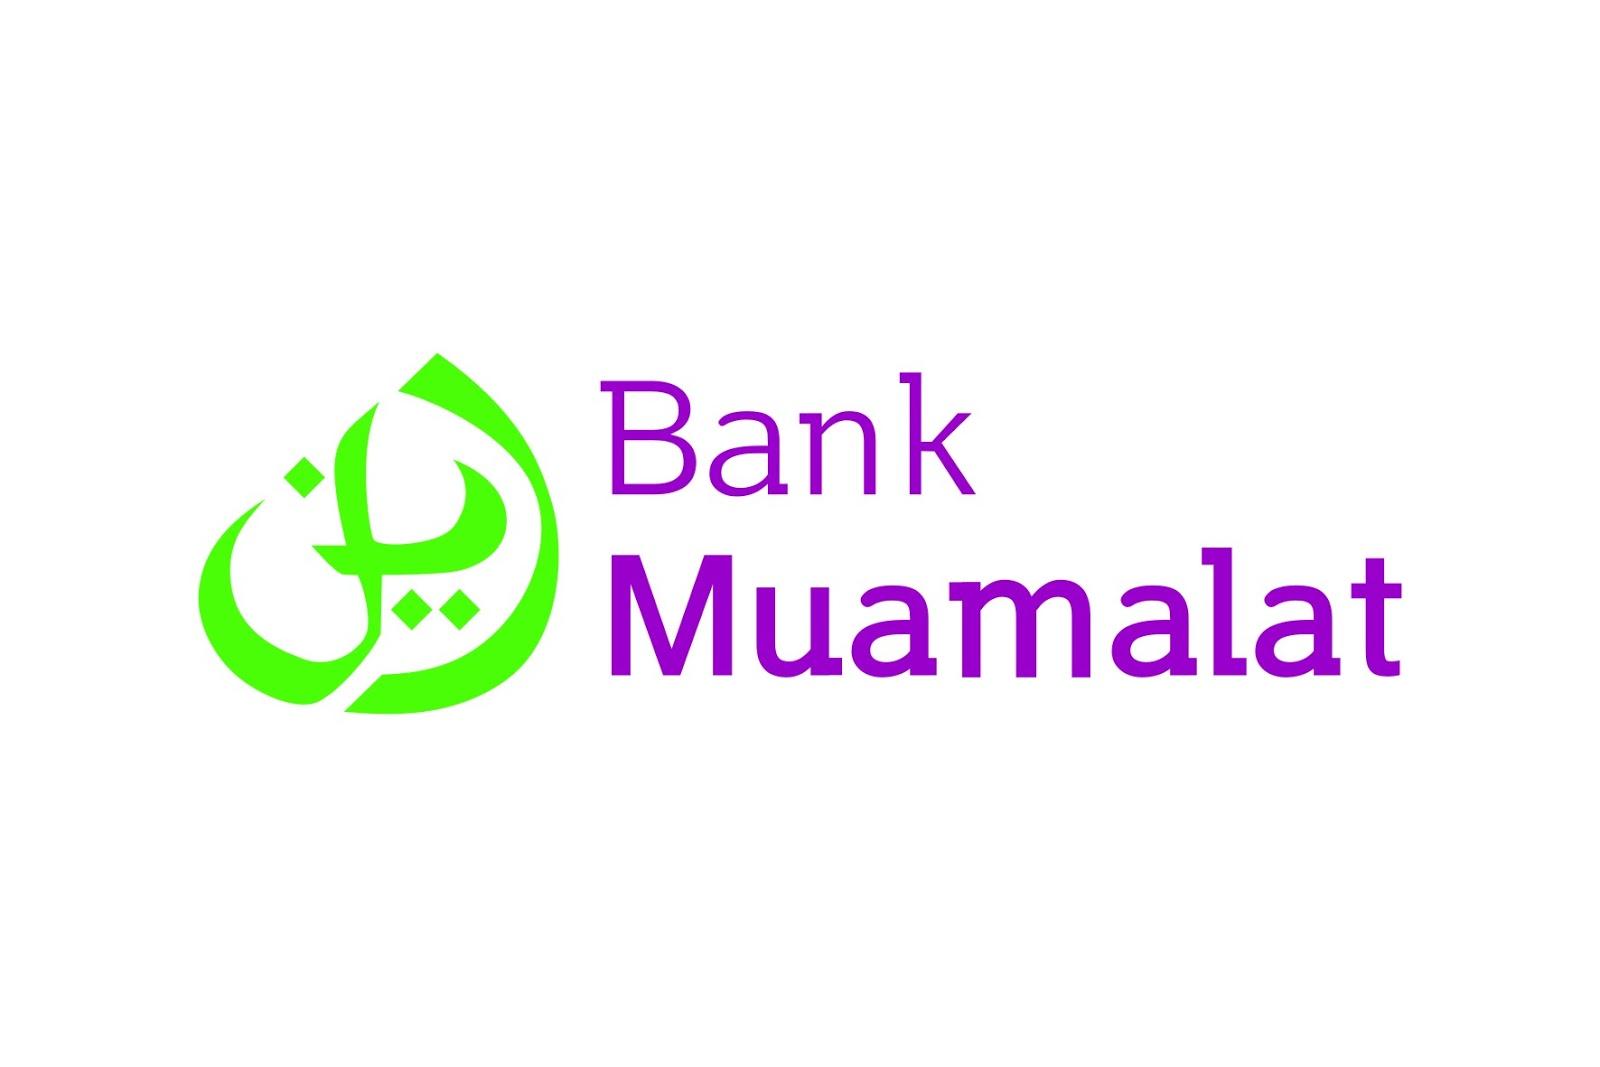 bank muamalat Logo photo - 1